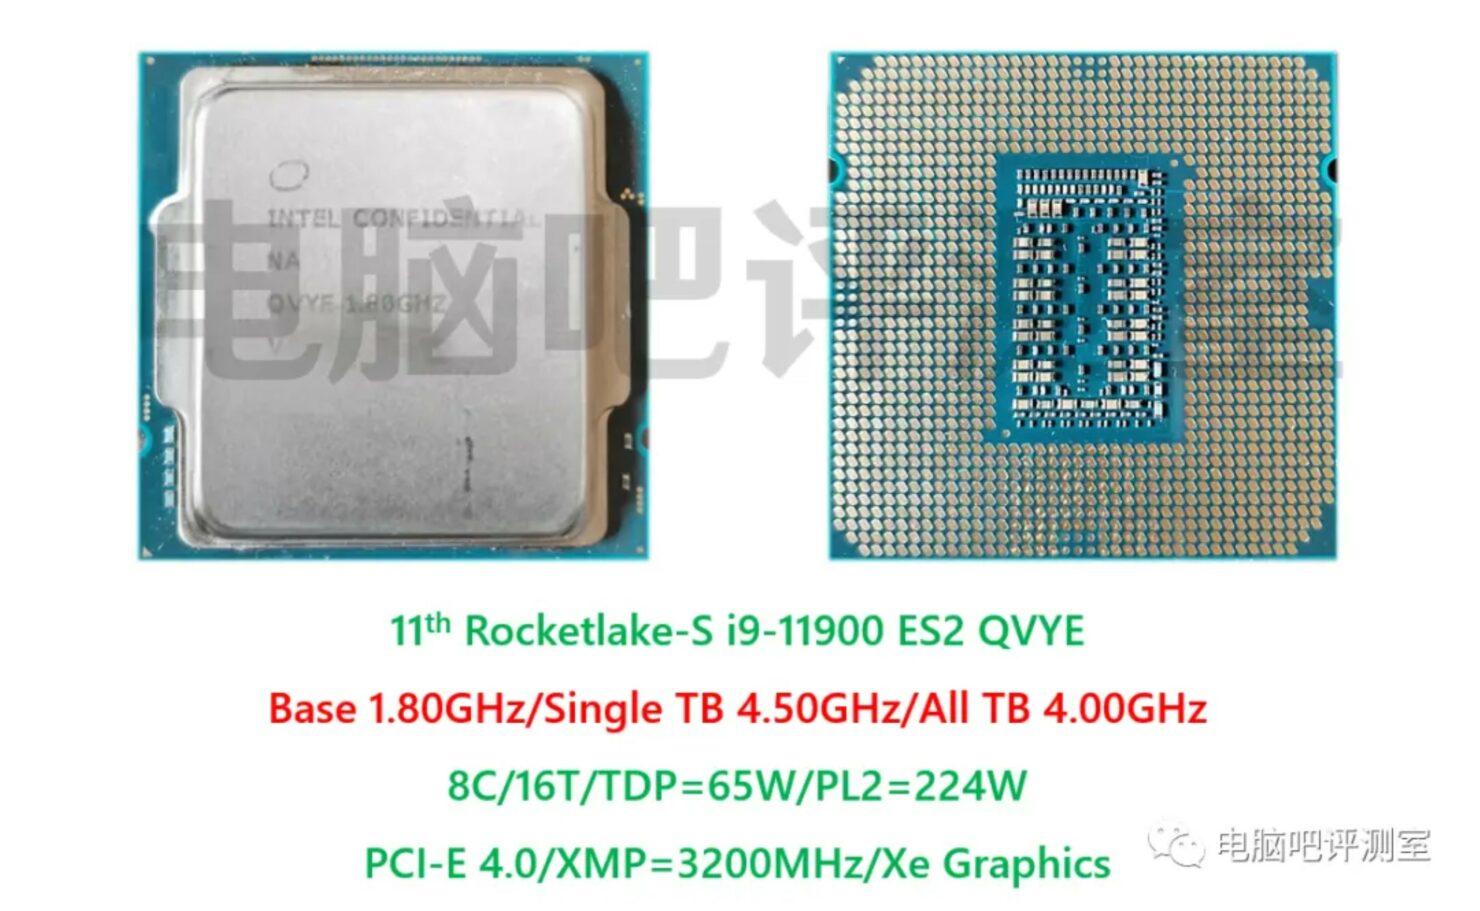 intel-core-i9-11900-rocket-lake-8-core-desktop-cpu-_1-custom